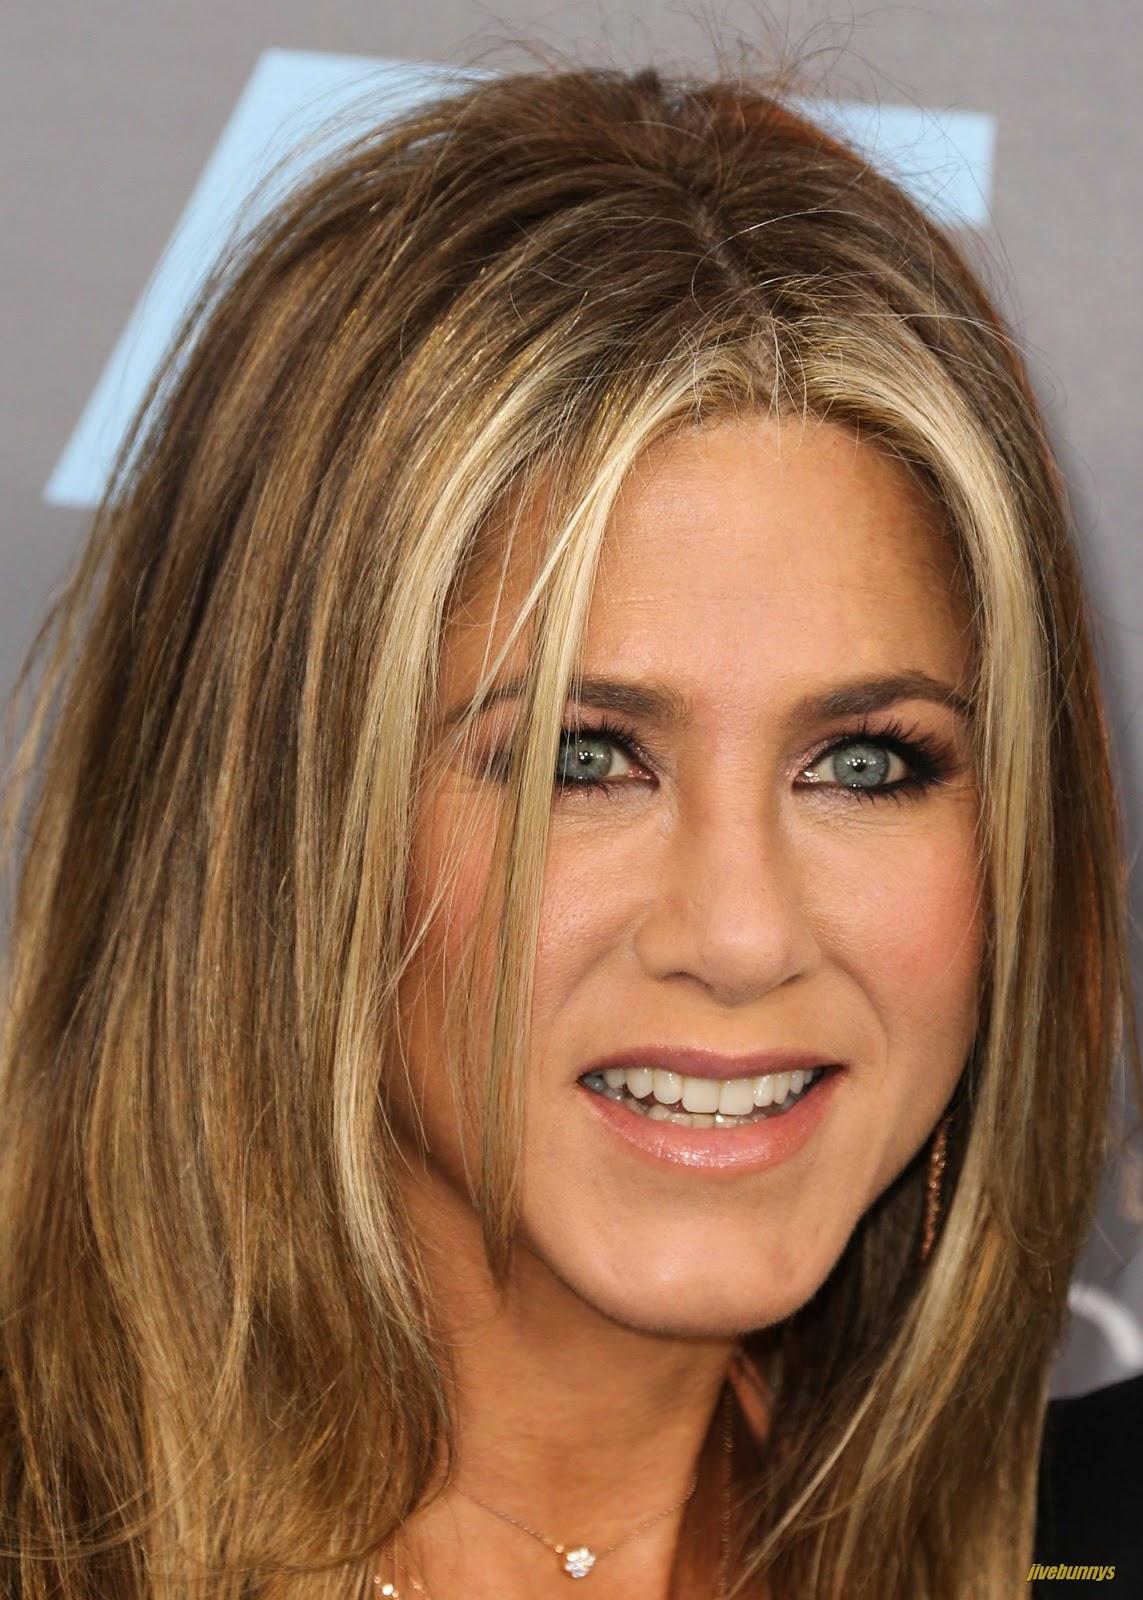 Jivebunnys Female Celebrity Picture Gallery: Jennifer Aniston ...